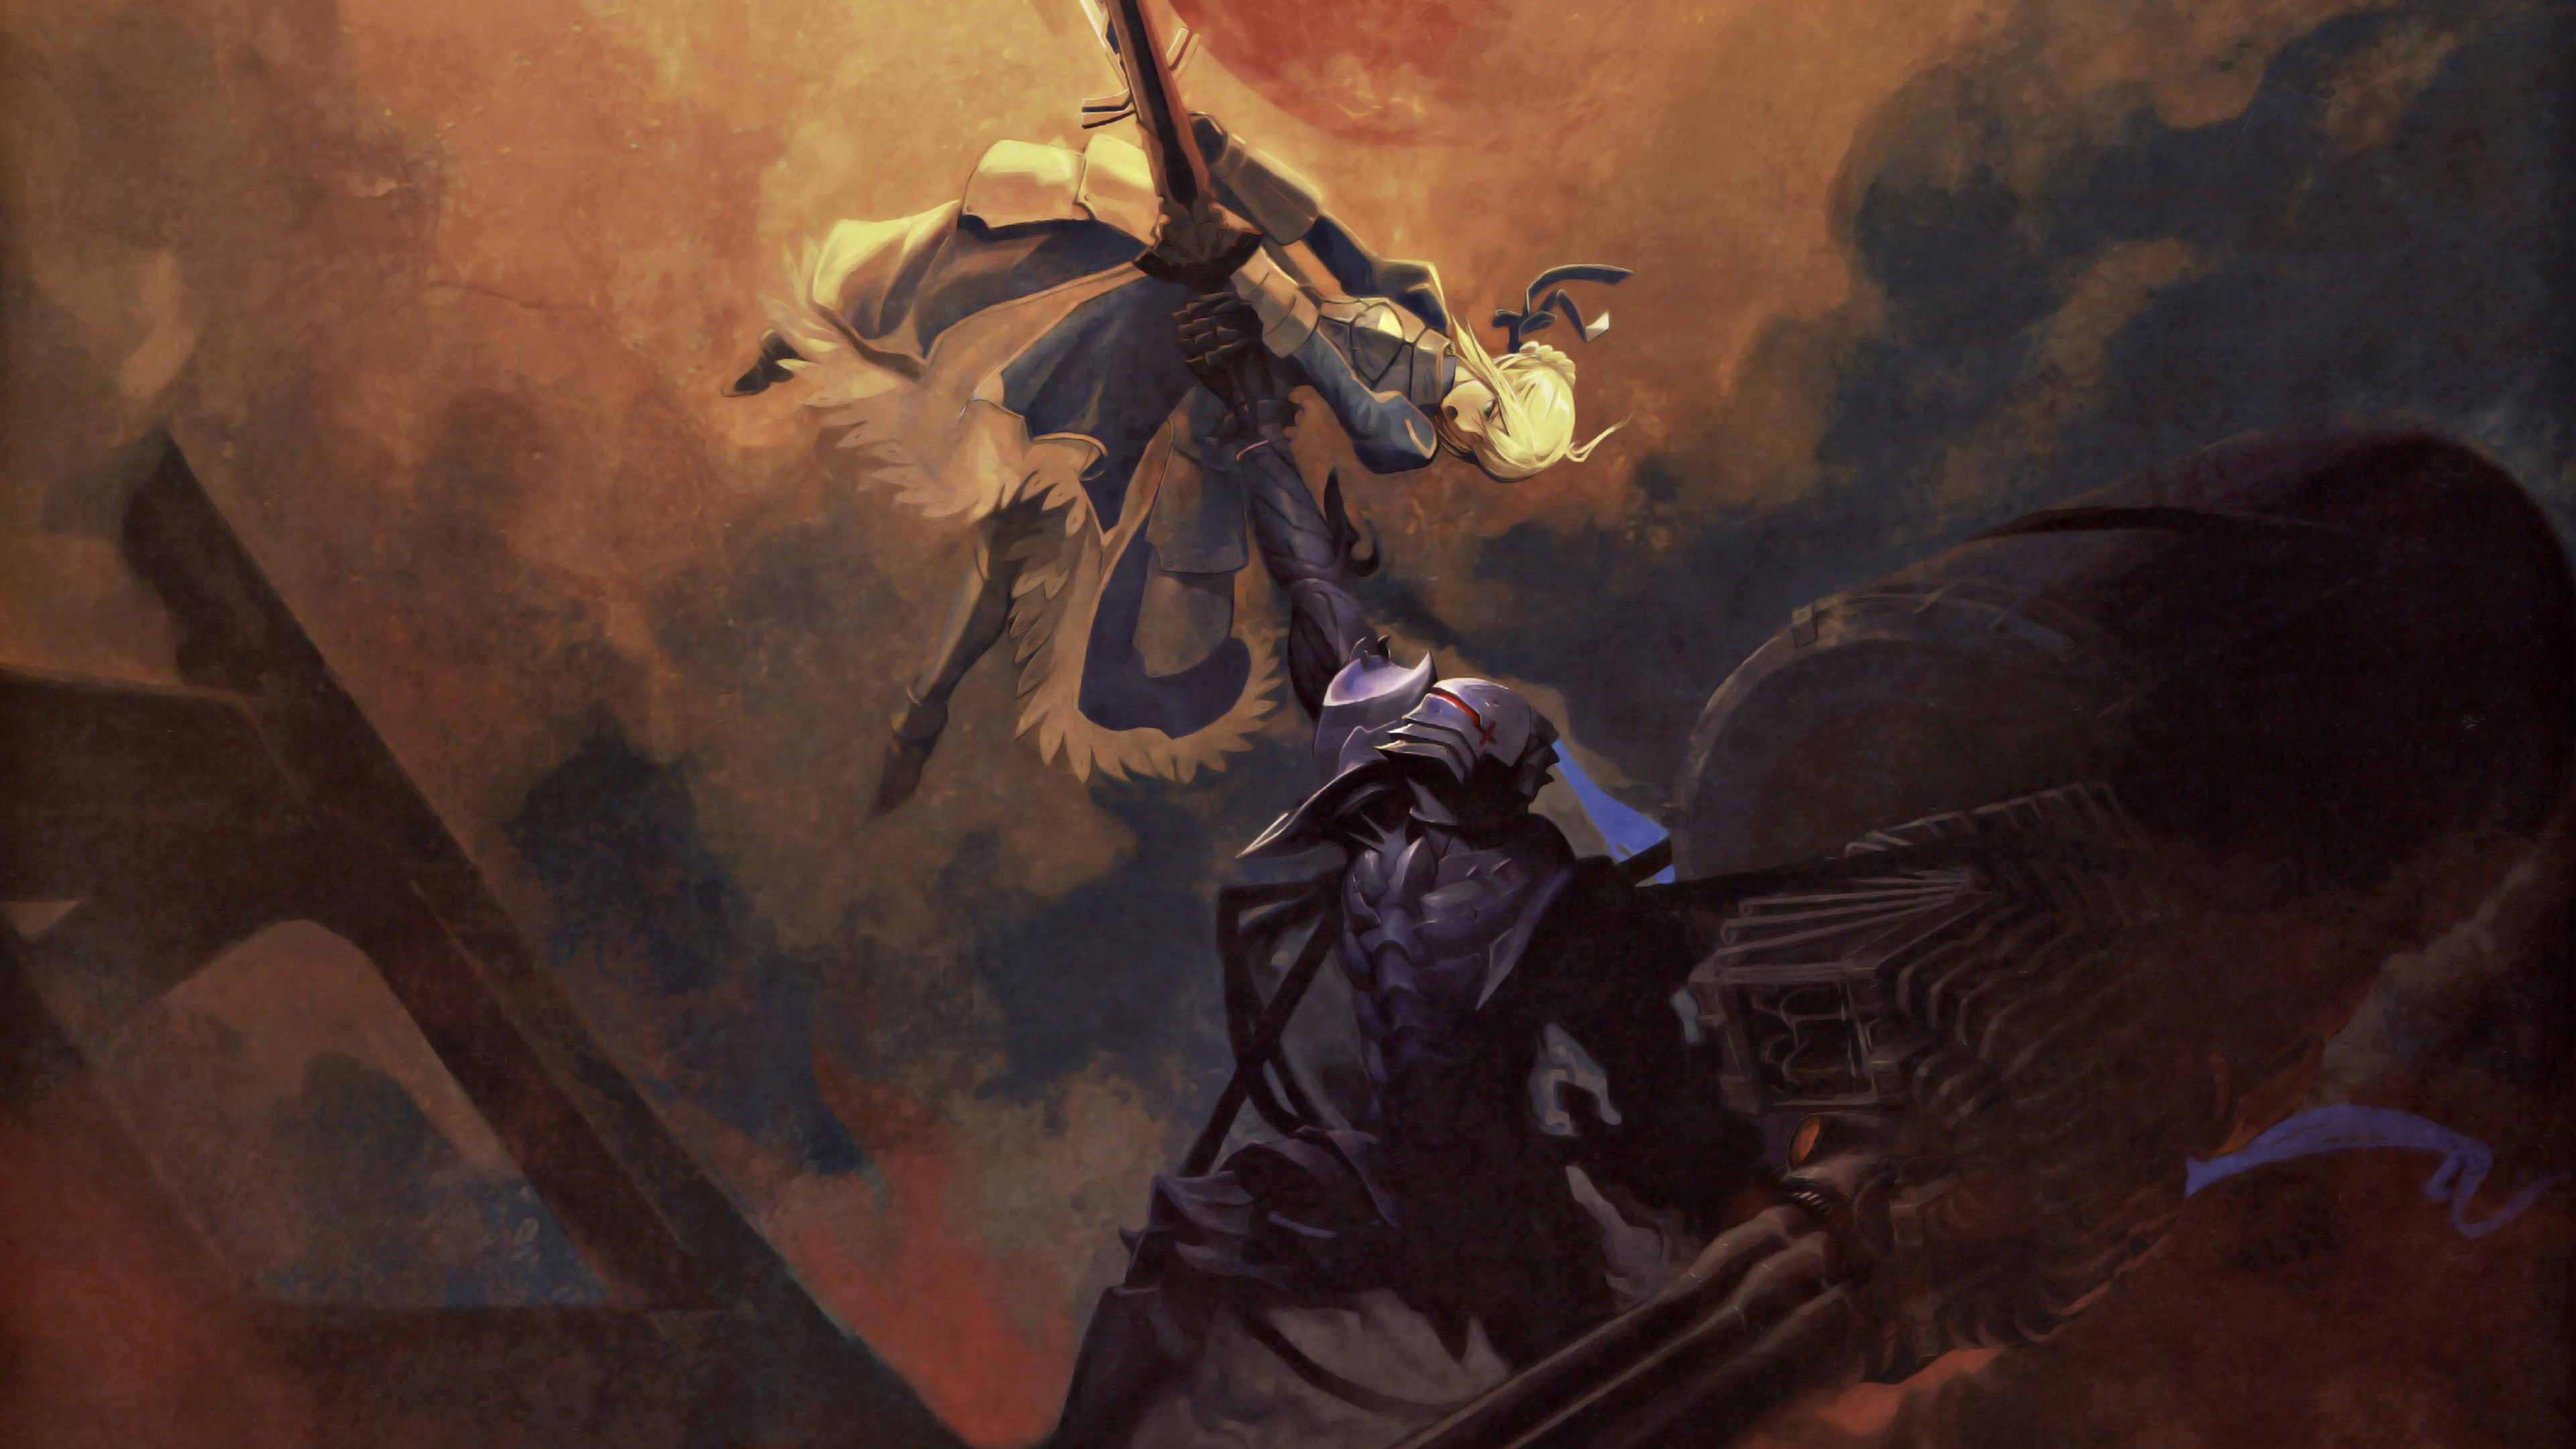 44 Berserker Fate Zero Hd Wallpapers Background Images